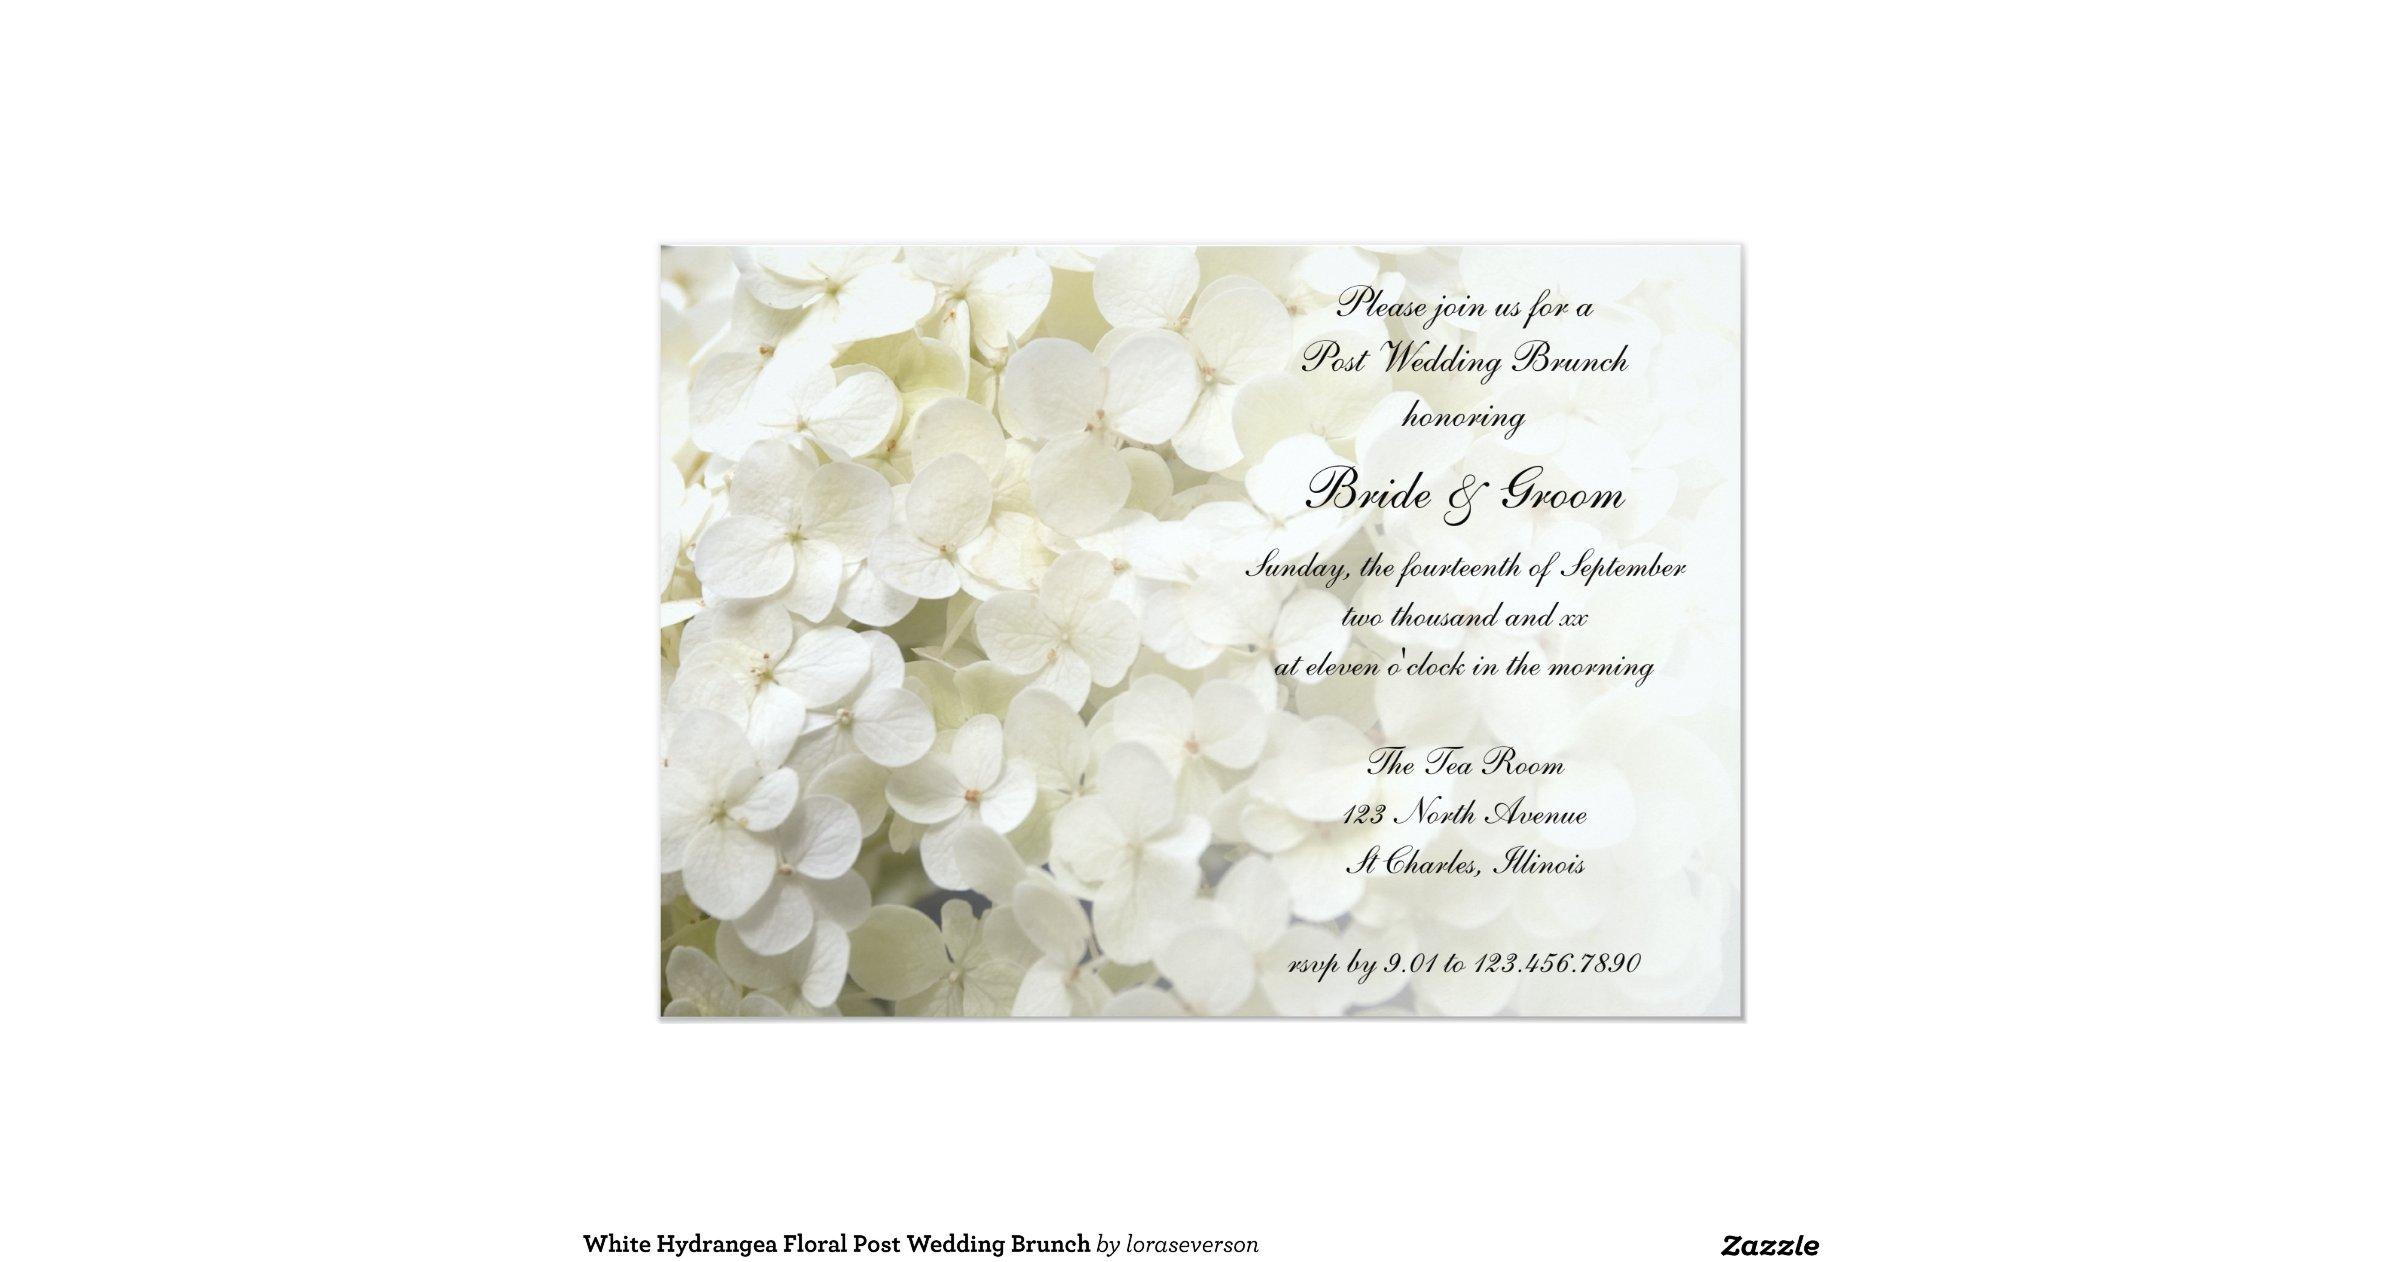 Post Wedding Brunch Invitation Wording: White_hydrangea_post_wedding_brunch_invitation